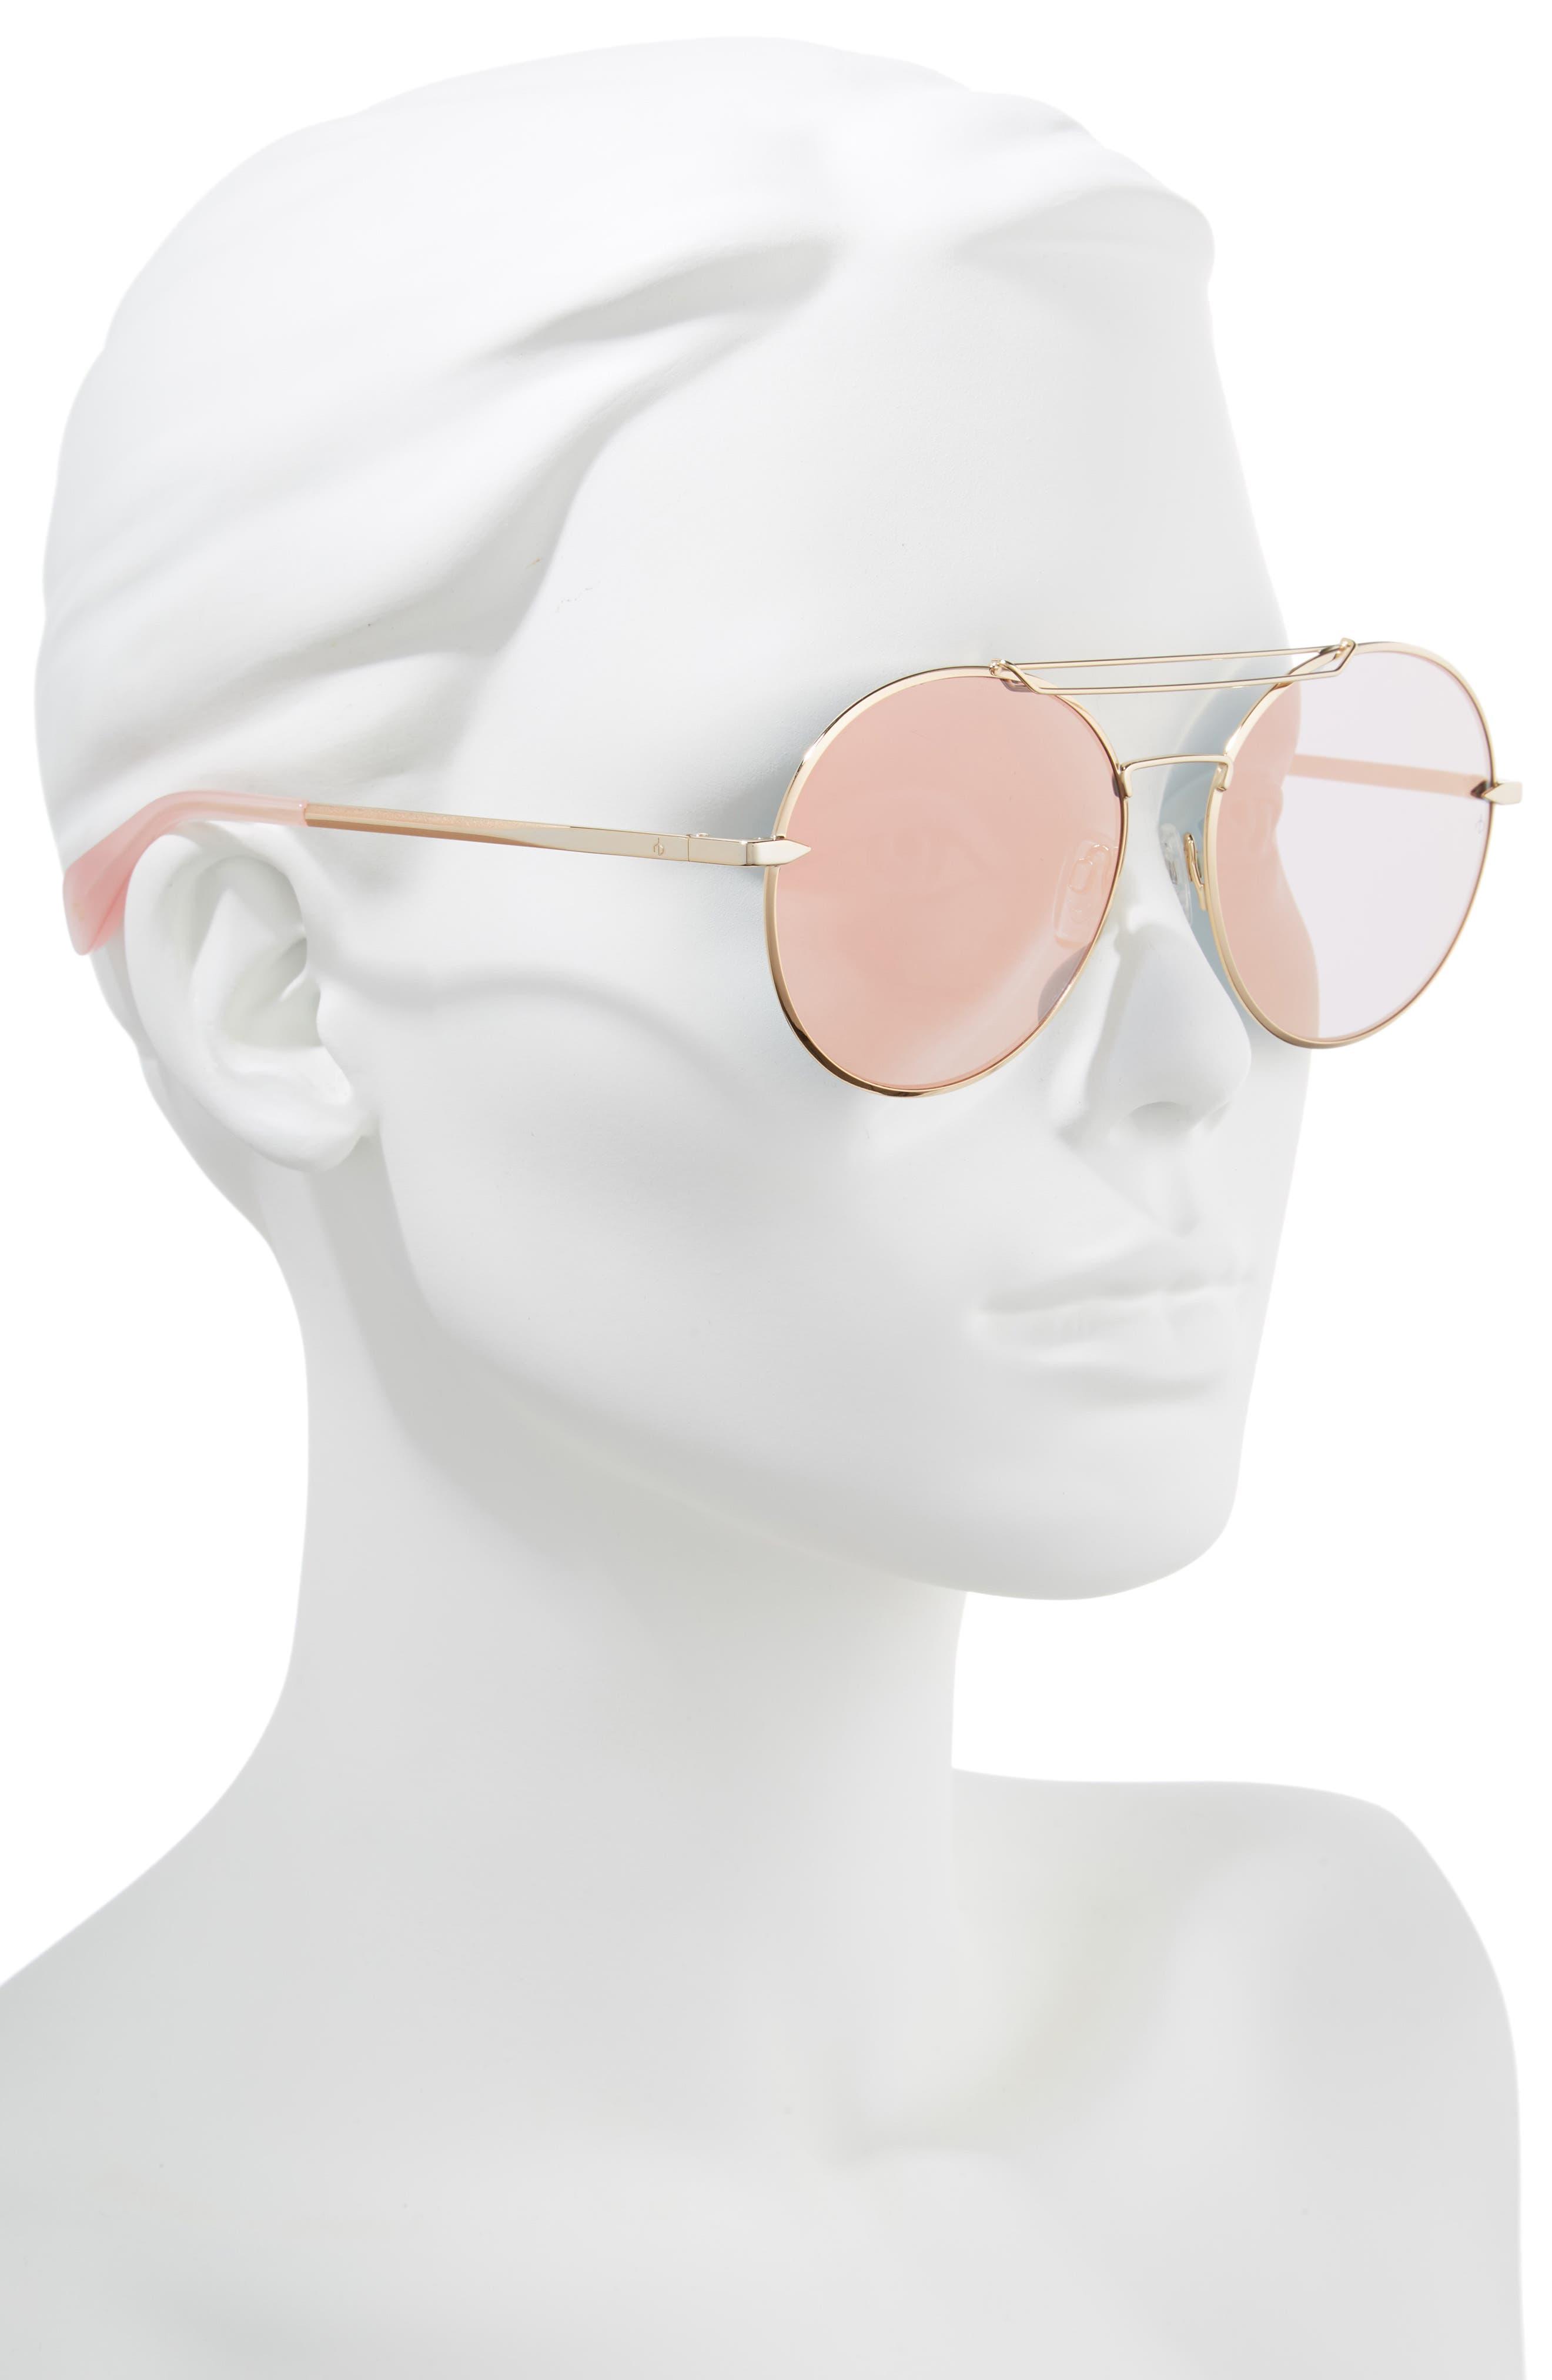 59mm Round Metal Aviator Sunglasses,                             Alternate thumbnail 2, color,                             ROSE GOLD